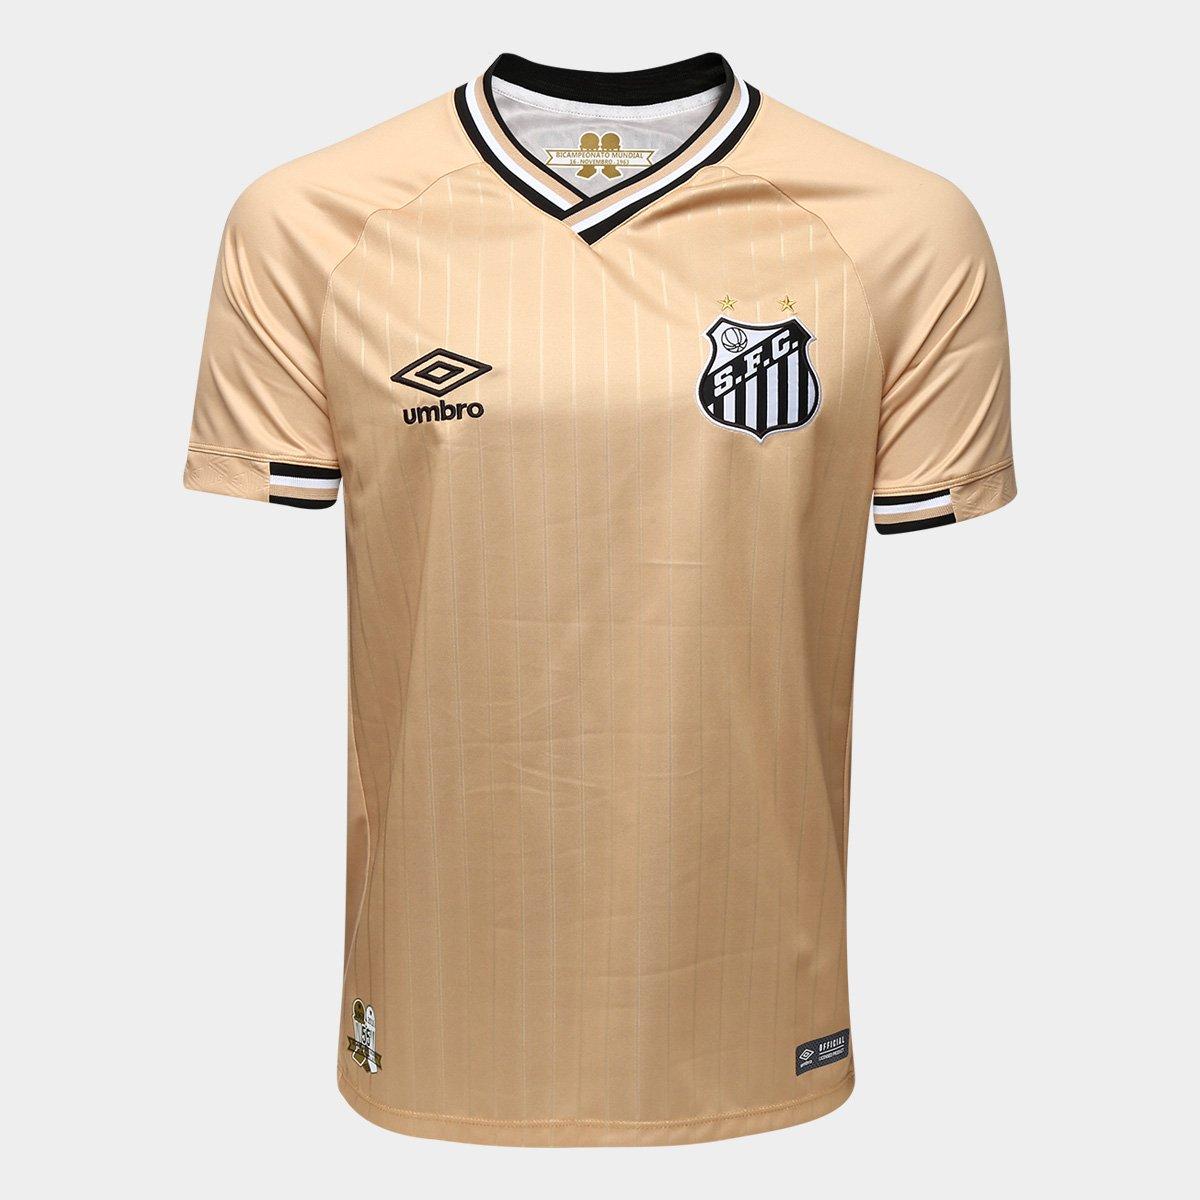 1b2960134e Camisa Santos III 2018 s n° - Torcedor Umbro Masculina - Dourado ...